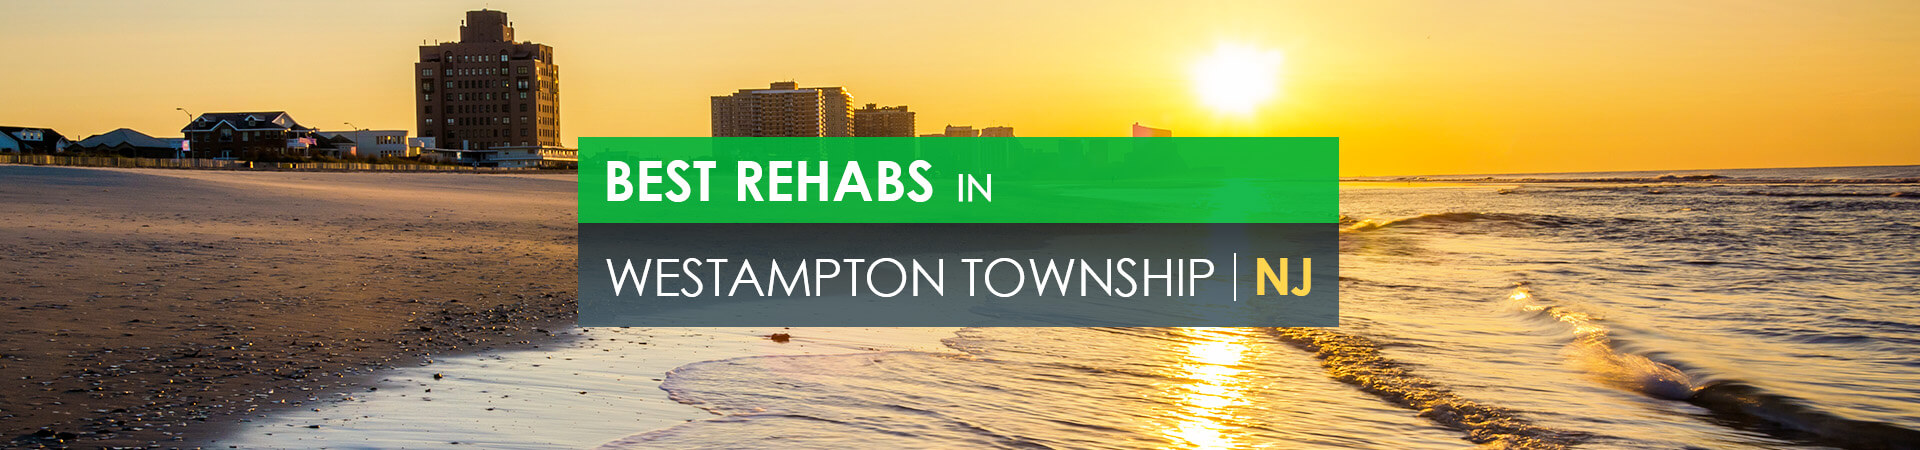 Best rehabs in Westampton Township, NJ